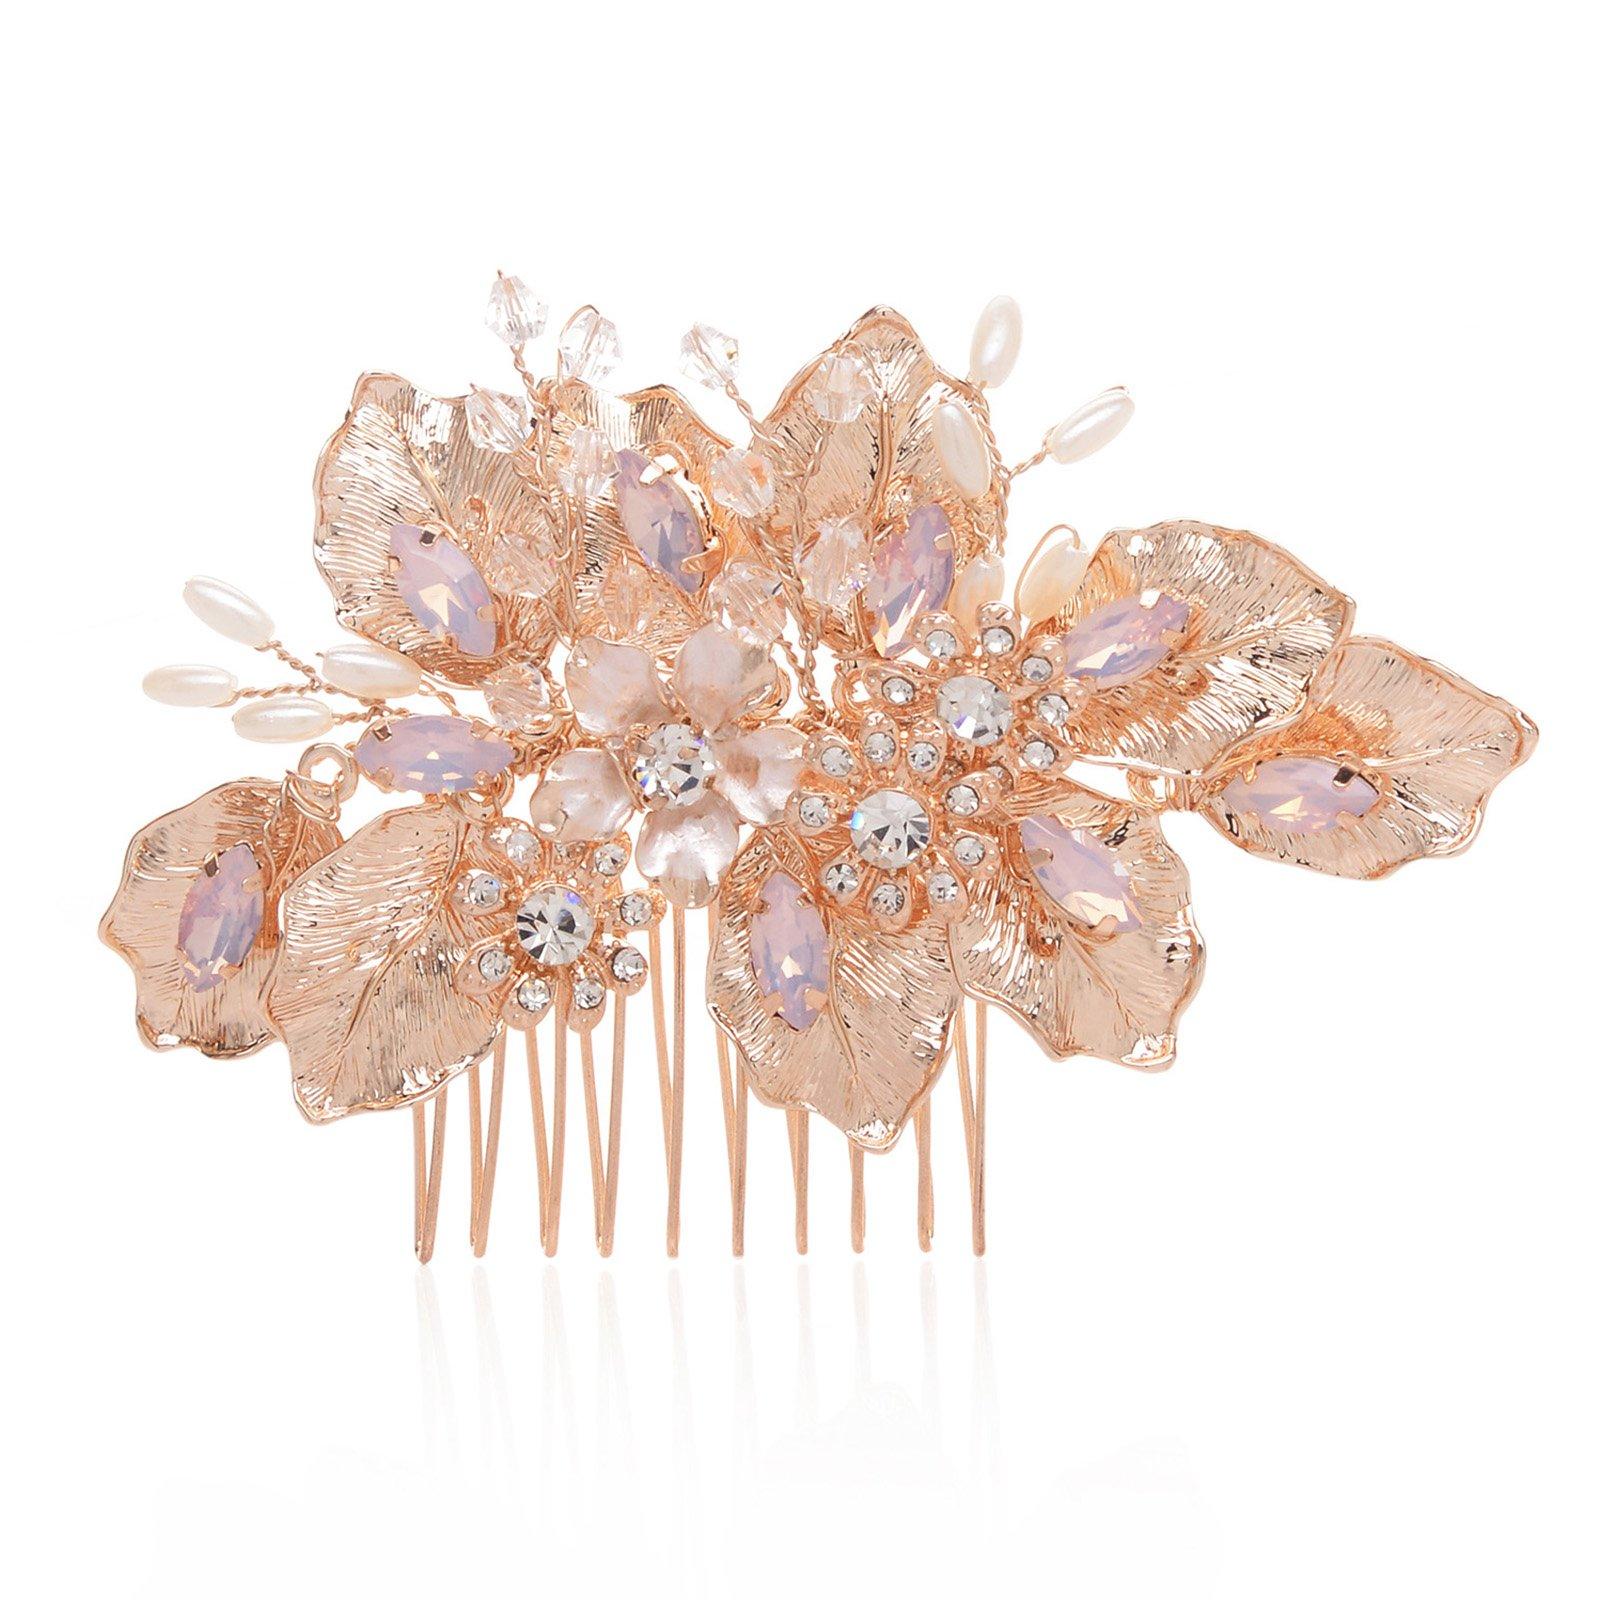 SWEETV Handmade Bridal Hair Comb Rose Gold Wedding Headpieces Crystal Pearl Comb for Bridesmaids